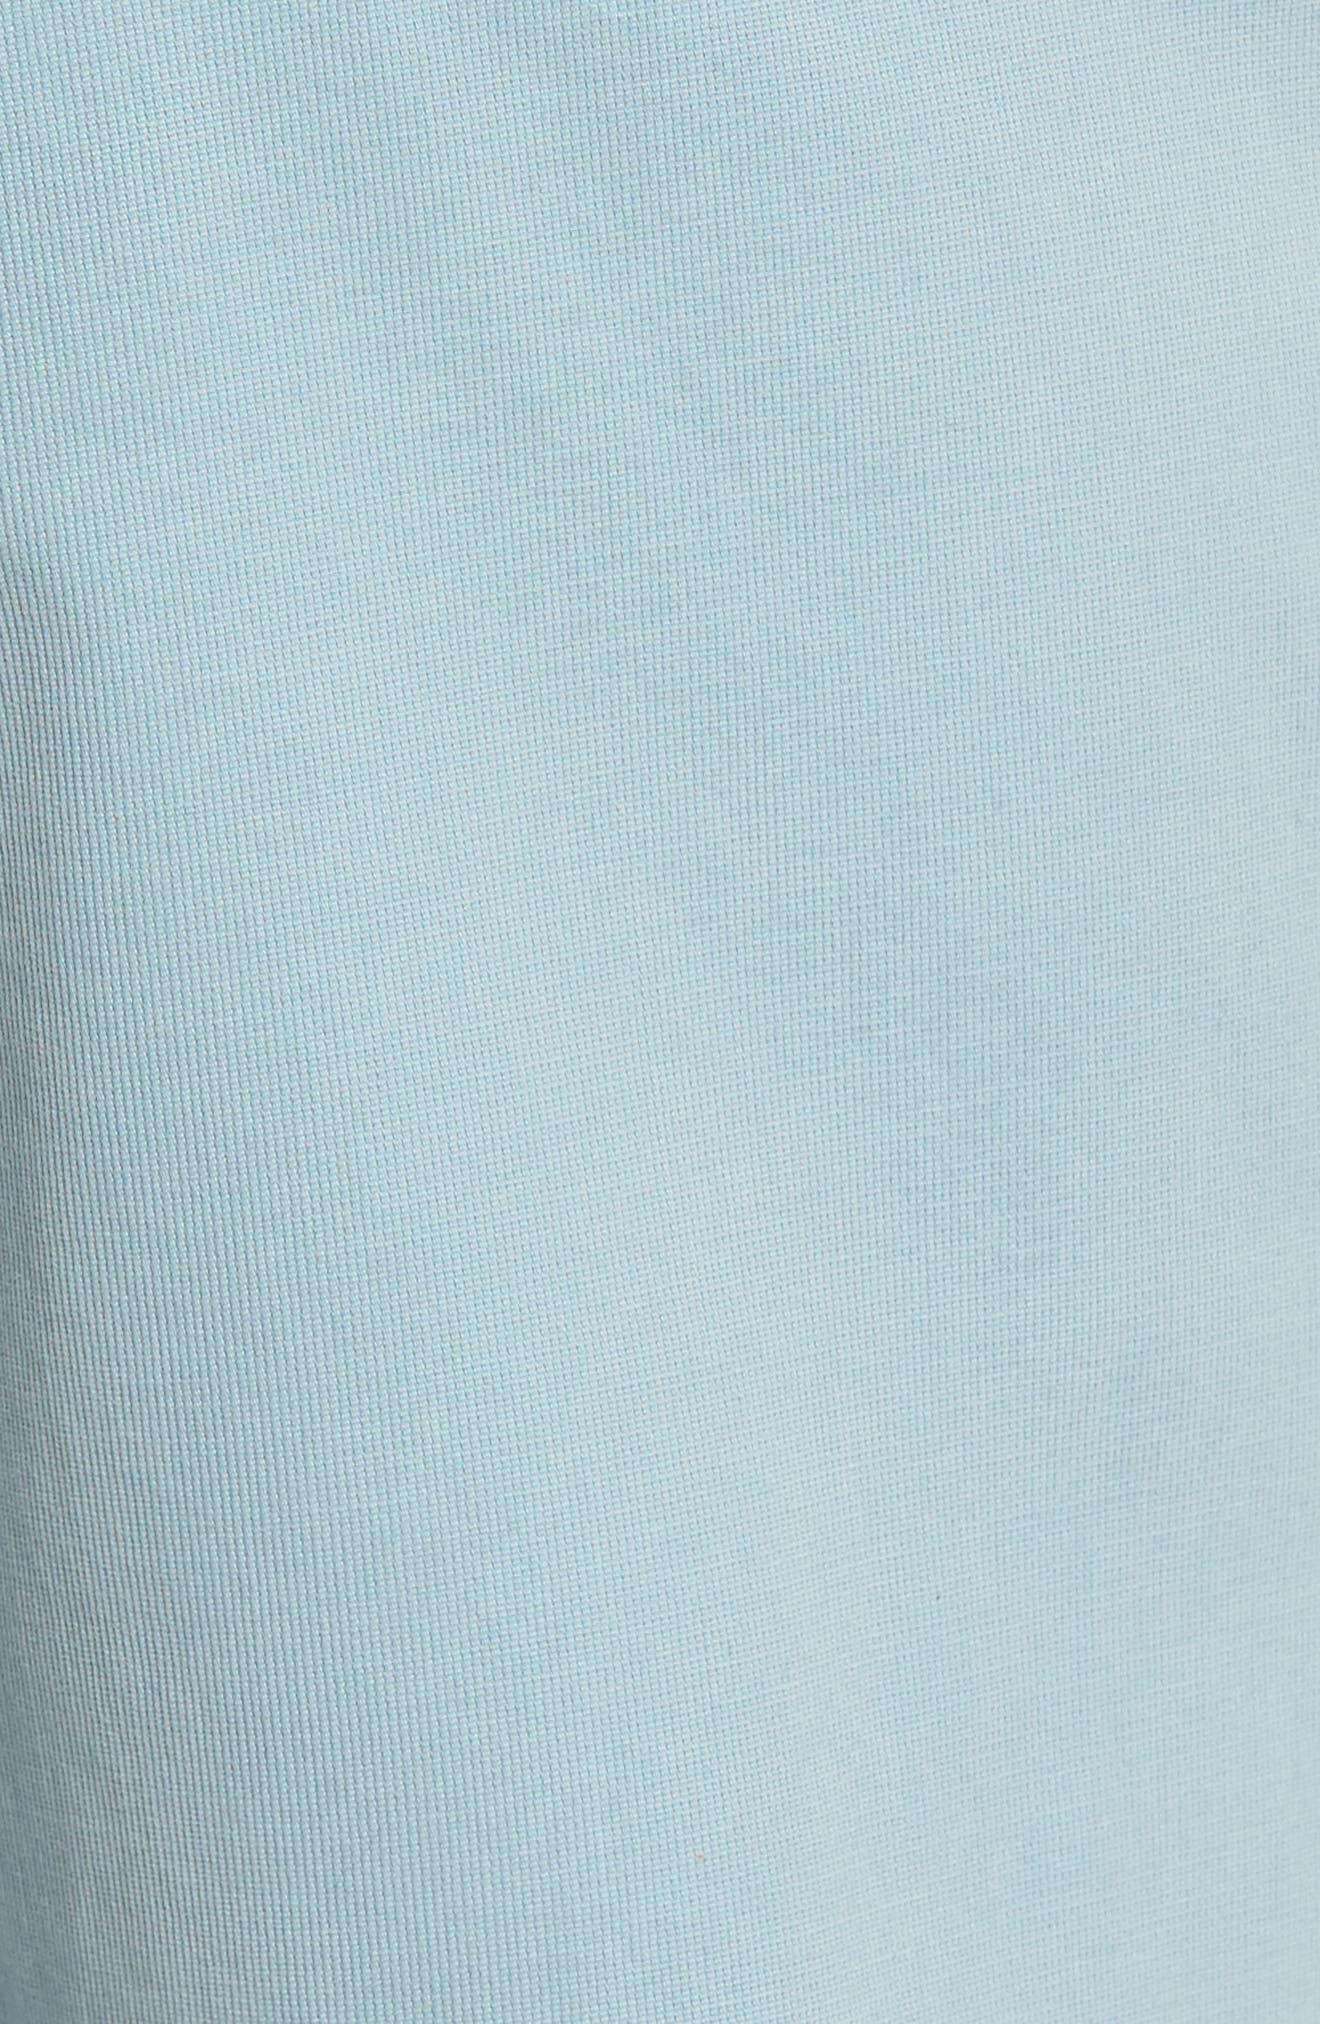 'Bedford & Sons' Shorts,                             Alternate thumbnail 47, color,